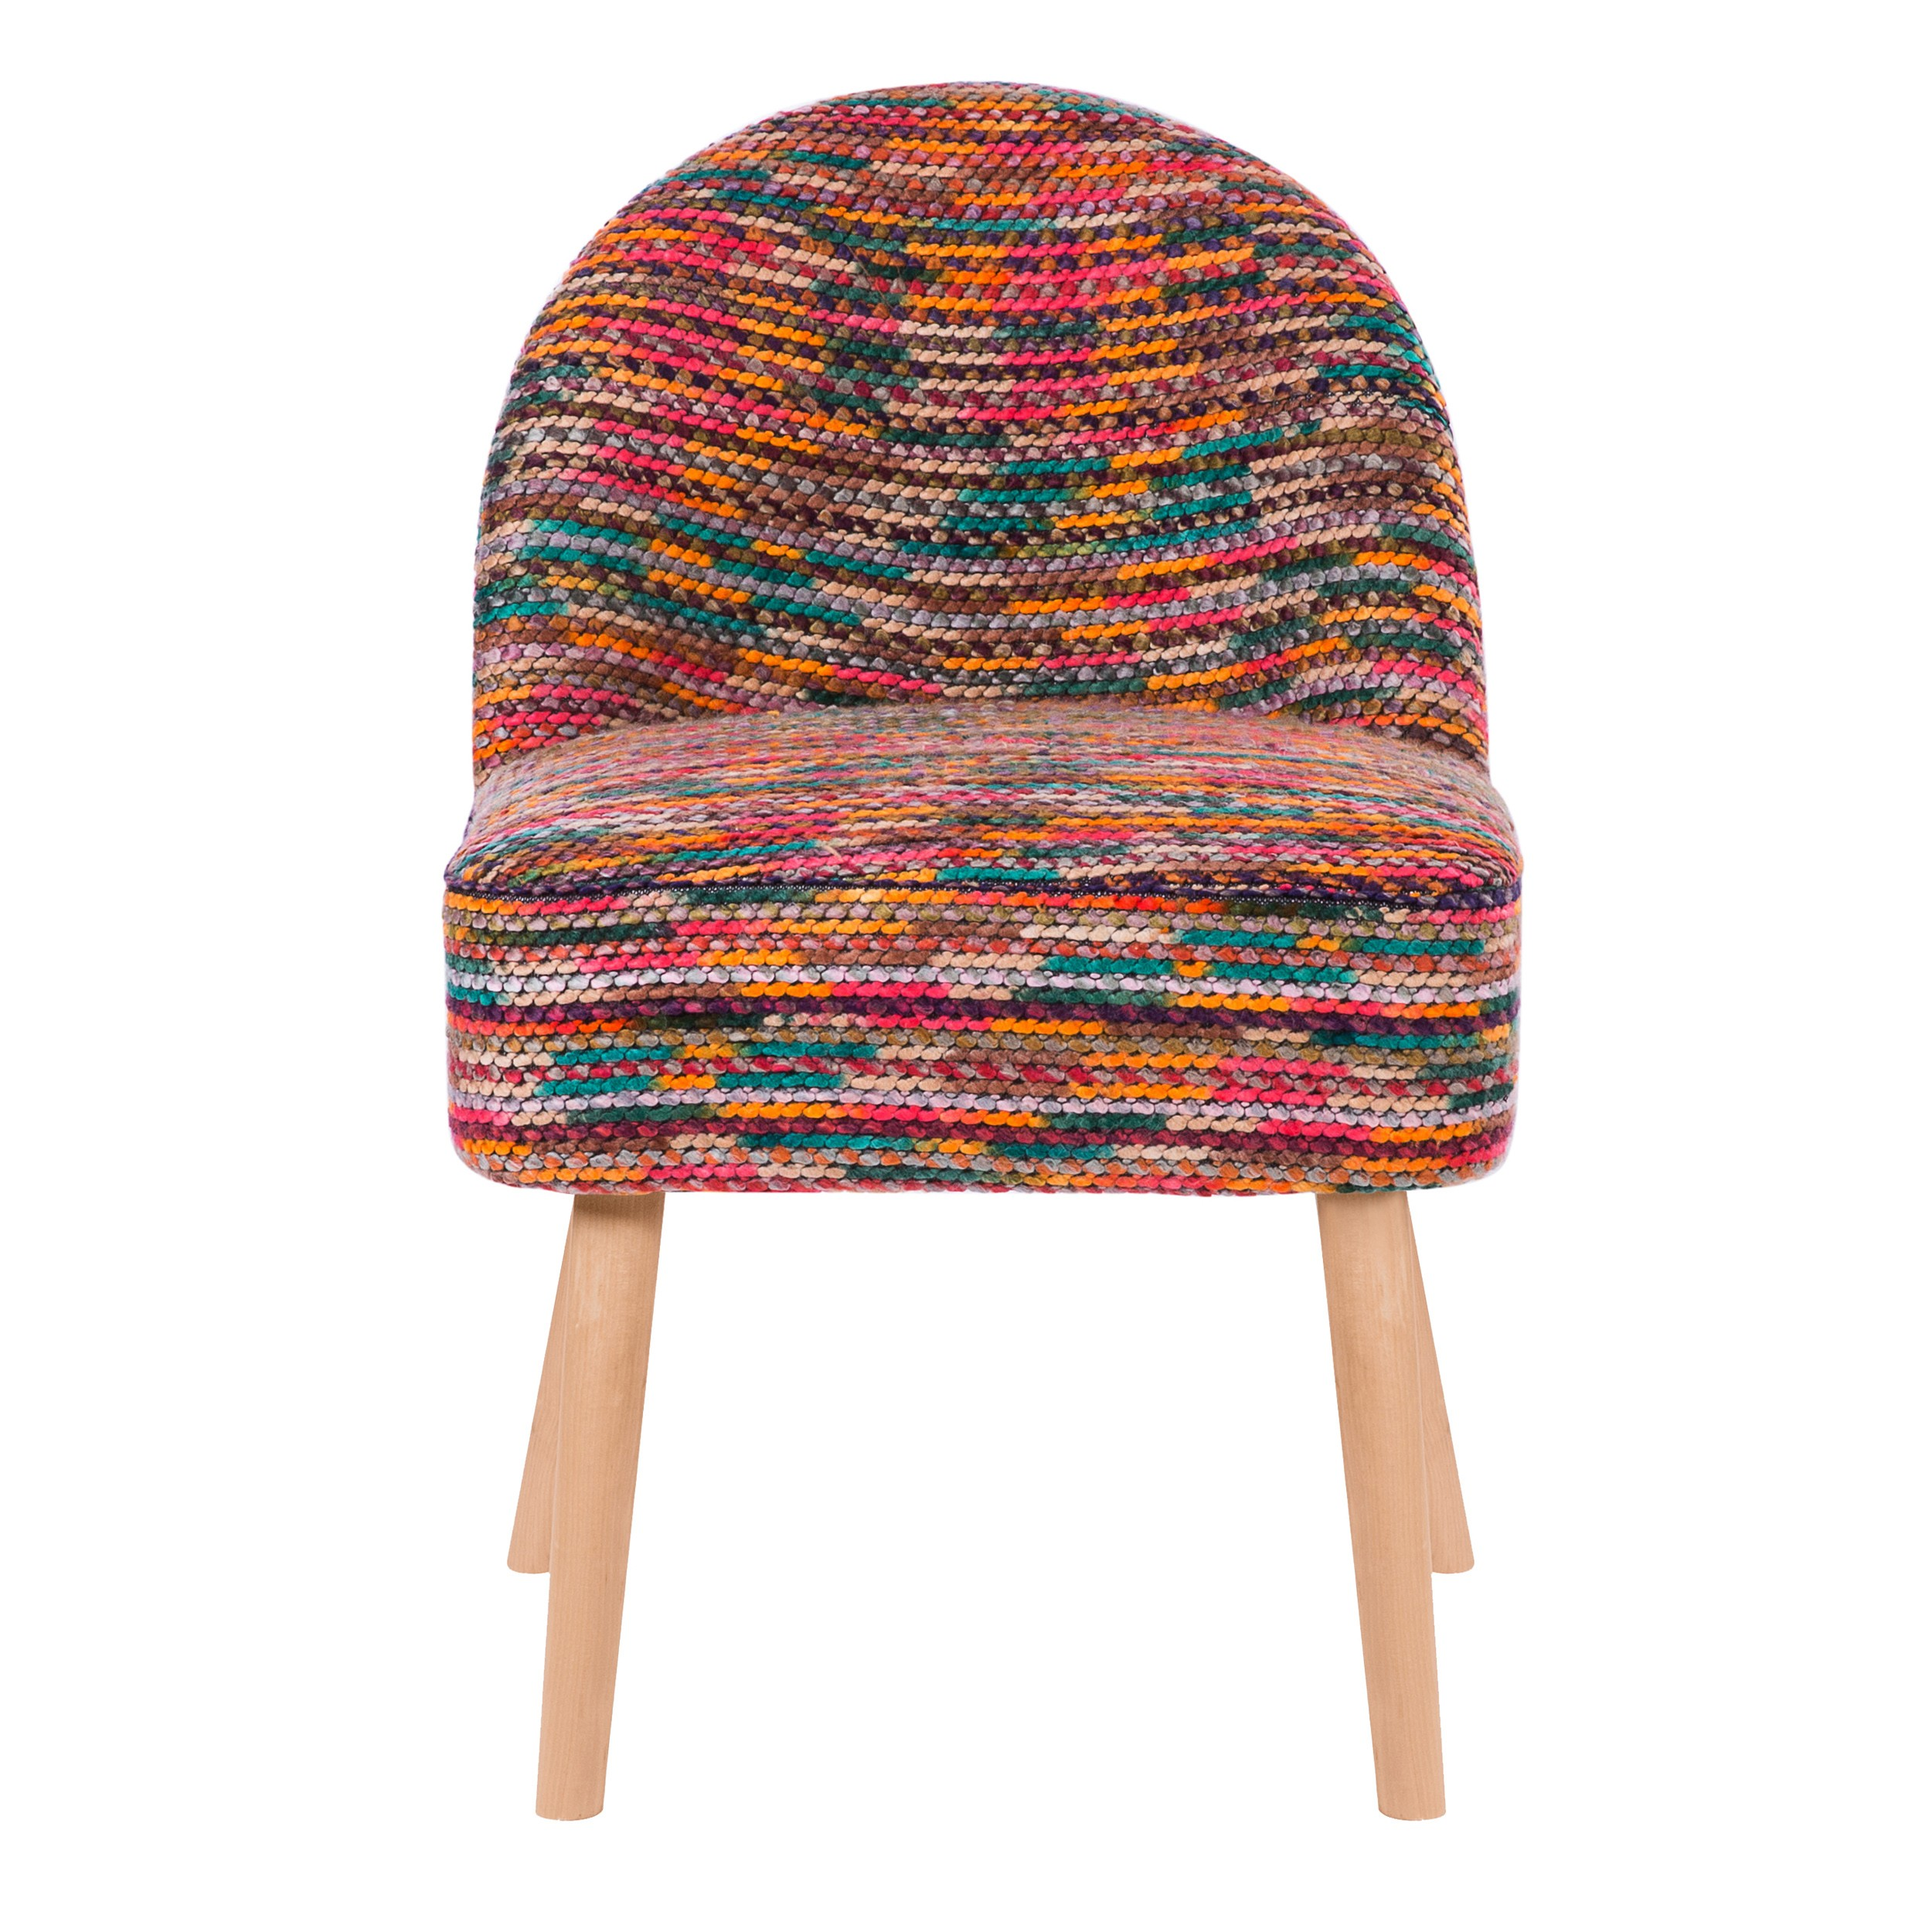 Fauteuil Milo multicolore : installez nos fauteuils Milo ...